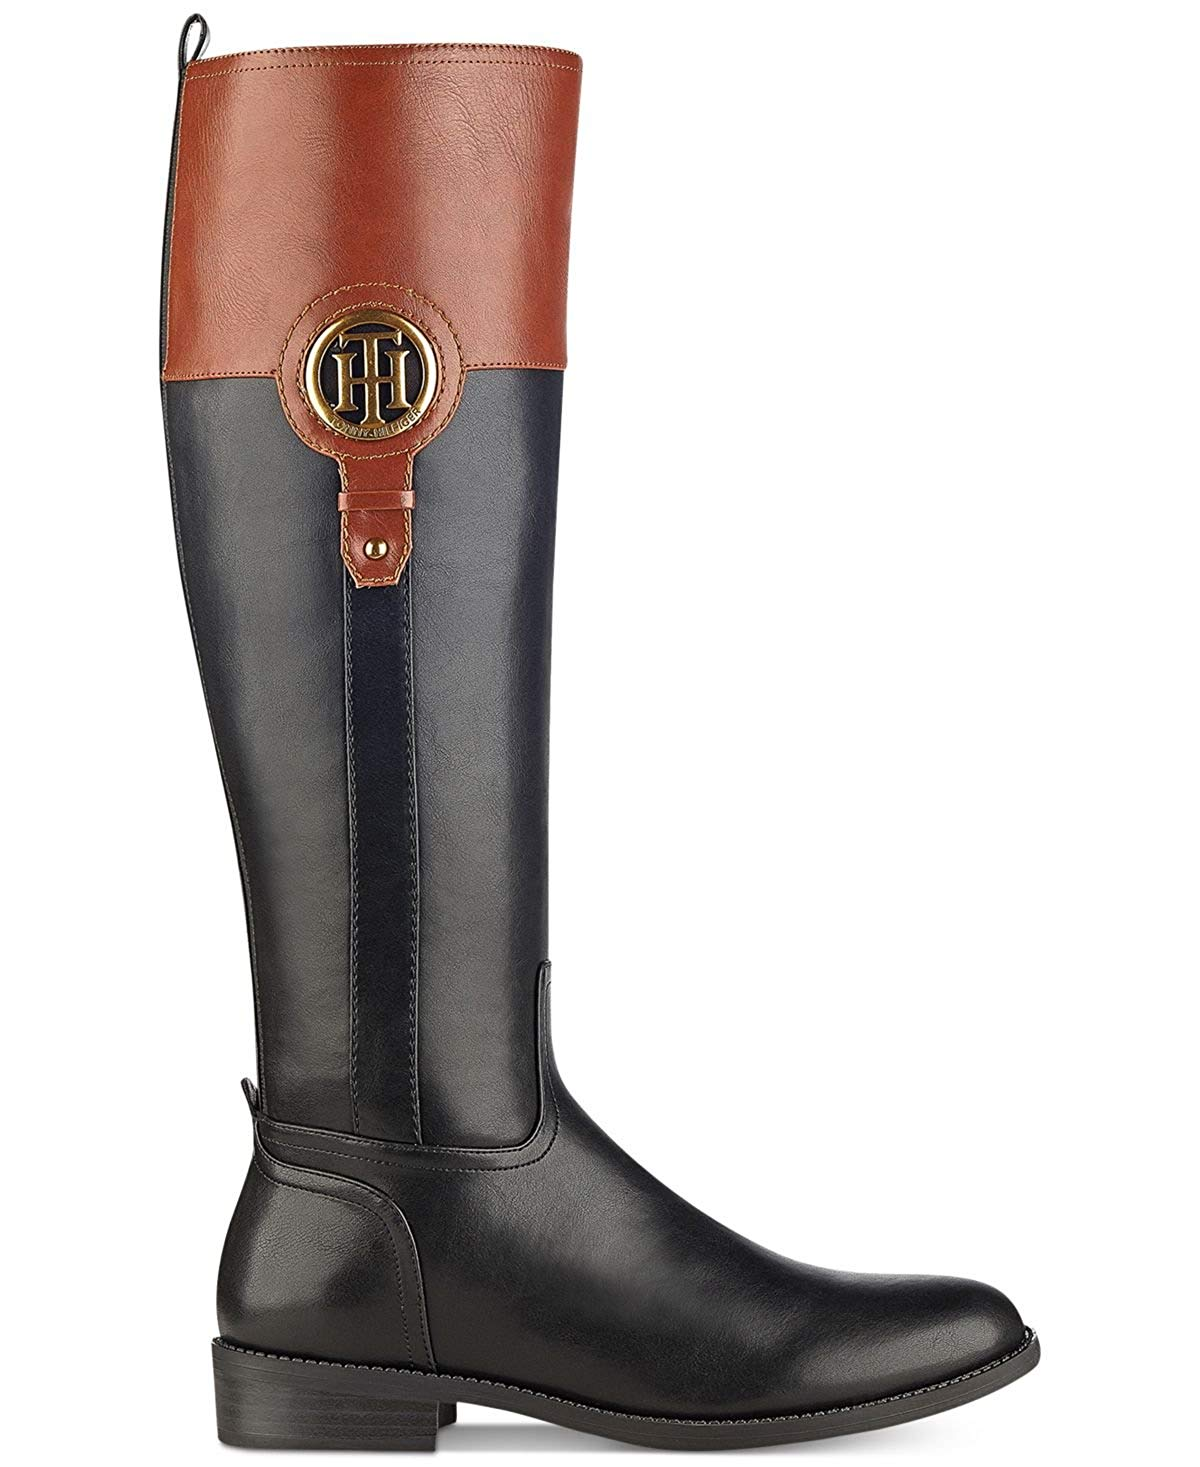 38bb5cb74d7 Tommy Hilfiger Womens ilia-2 Almond Toe Knee High Fashion Boots